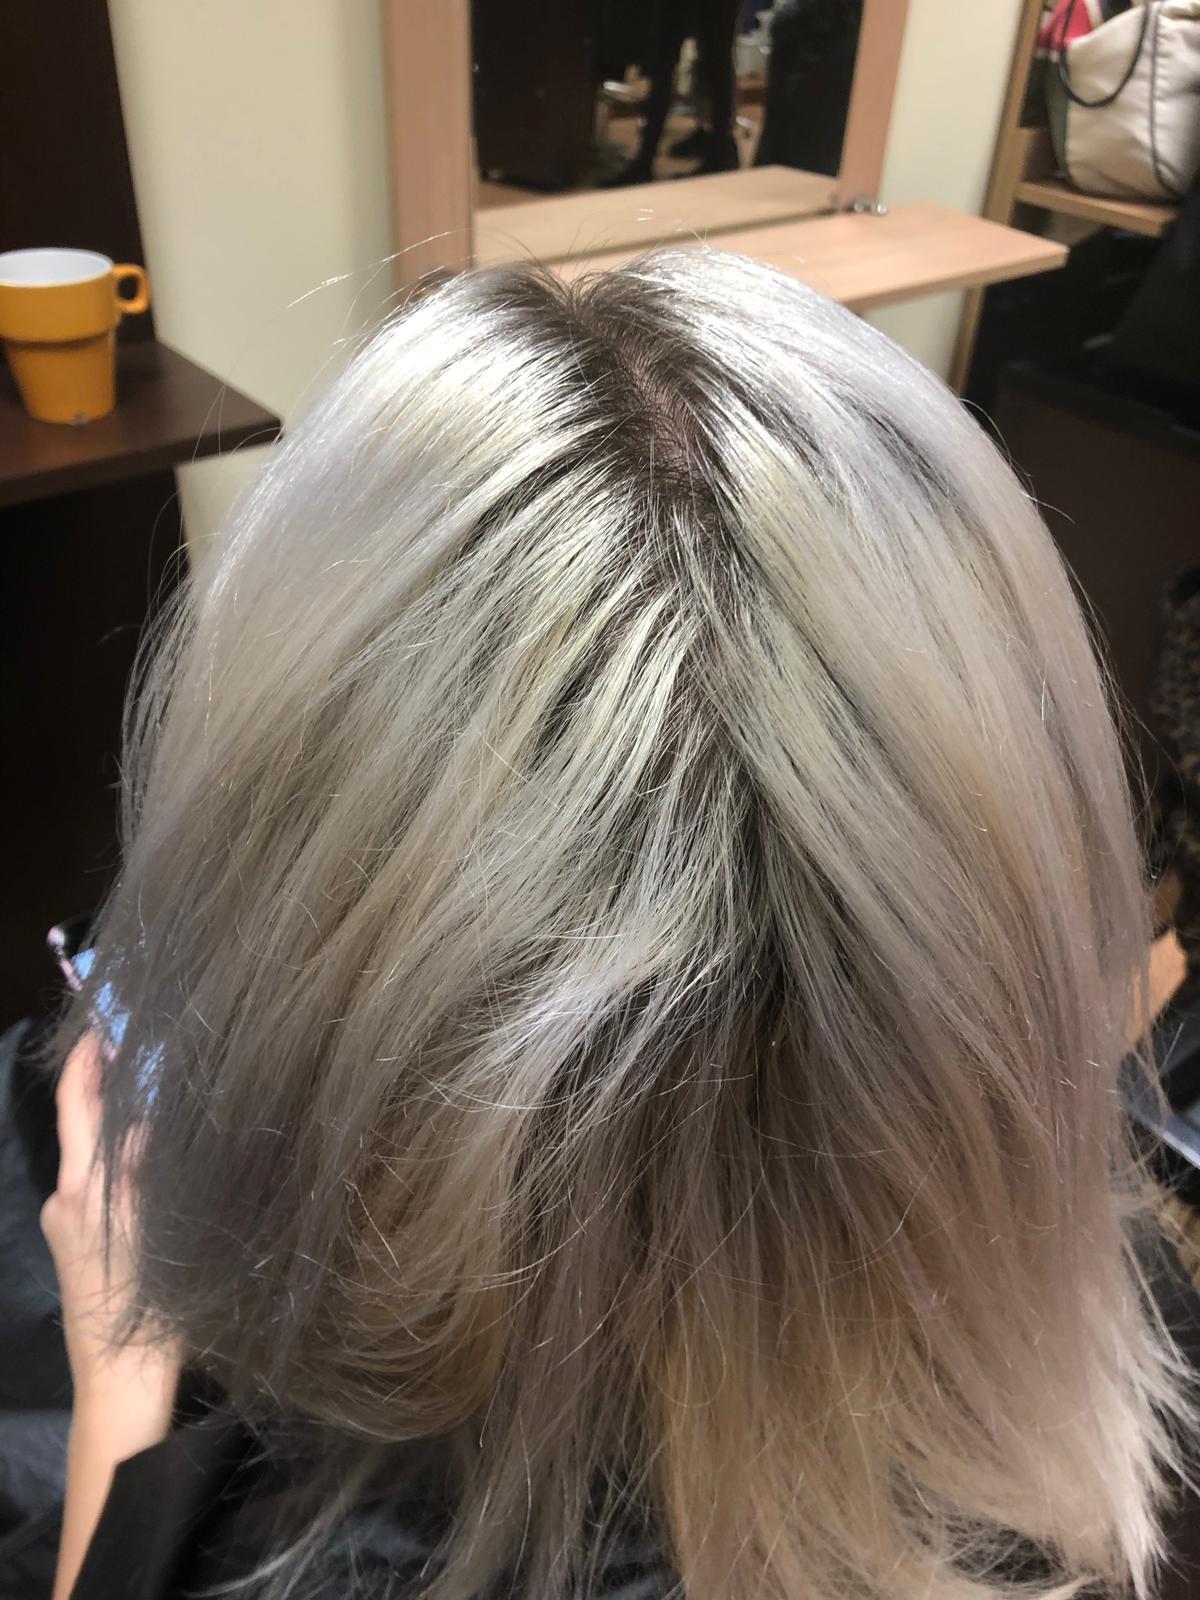 Venus-Beauty-Hair-Salon-Tavistock-Devon-Courses-Learning-Hannah-Woodgates-Confidential-Colours-Kim-Pope-Hairstylist-Milkshake-Phab-Silver-Hair-Before.JPG